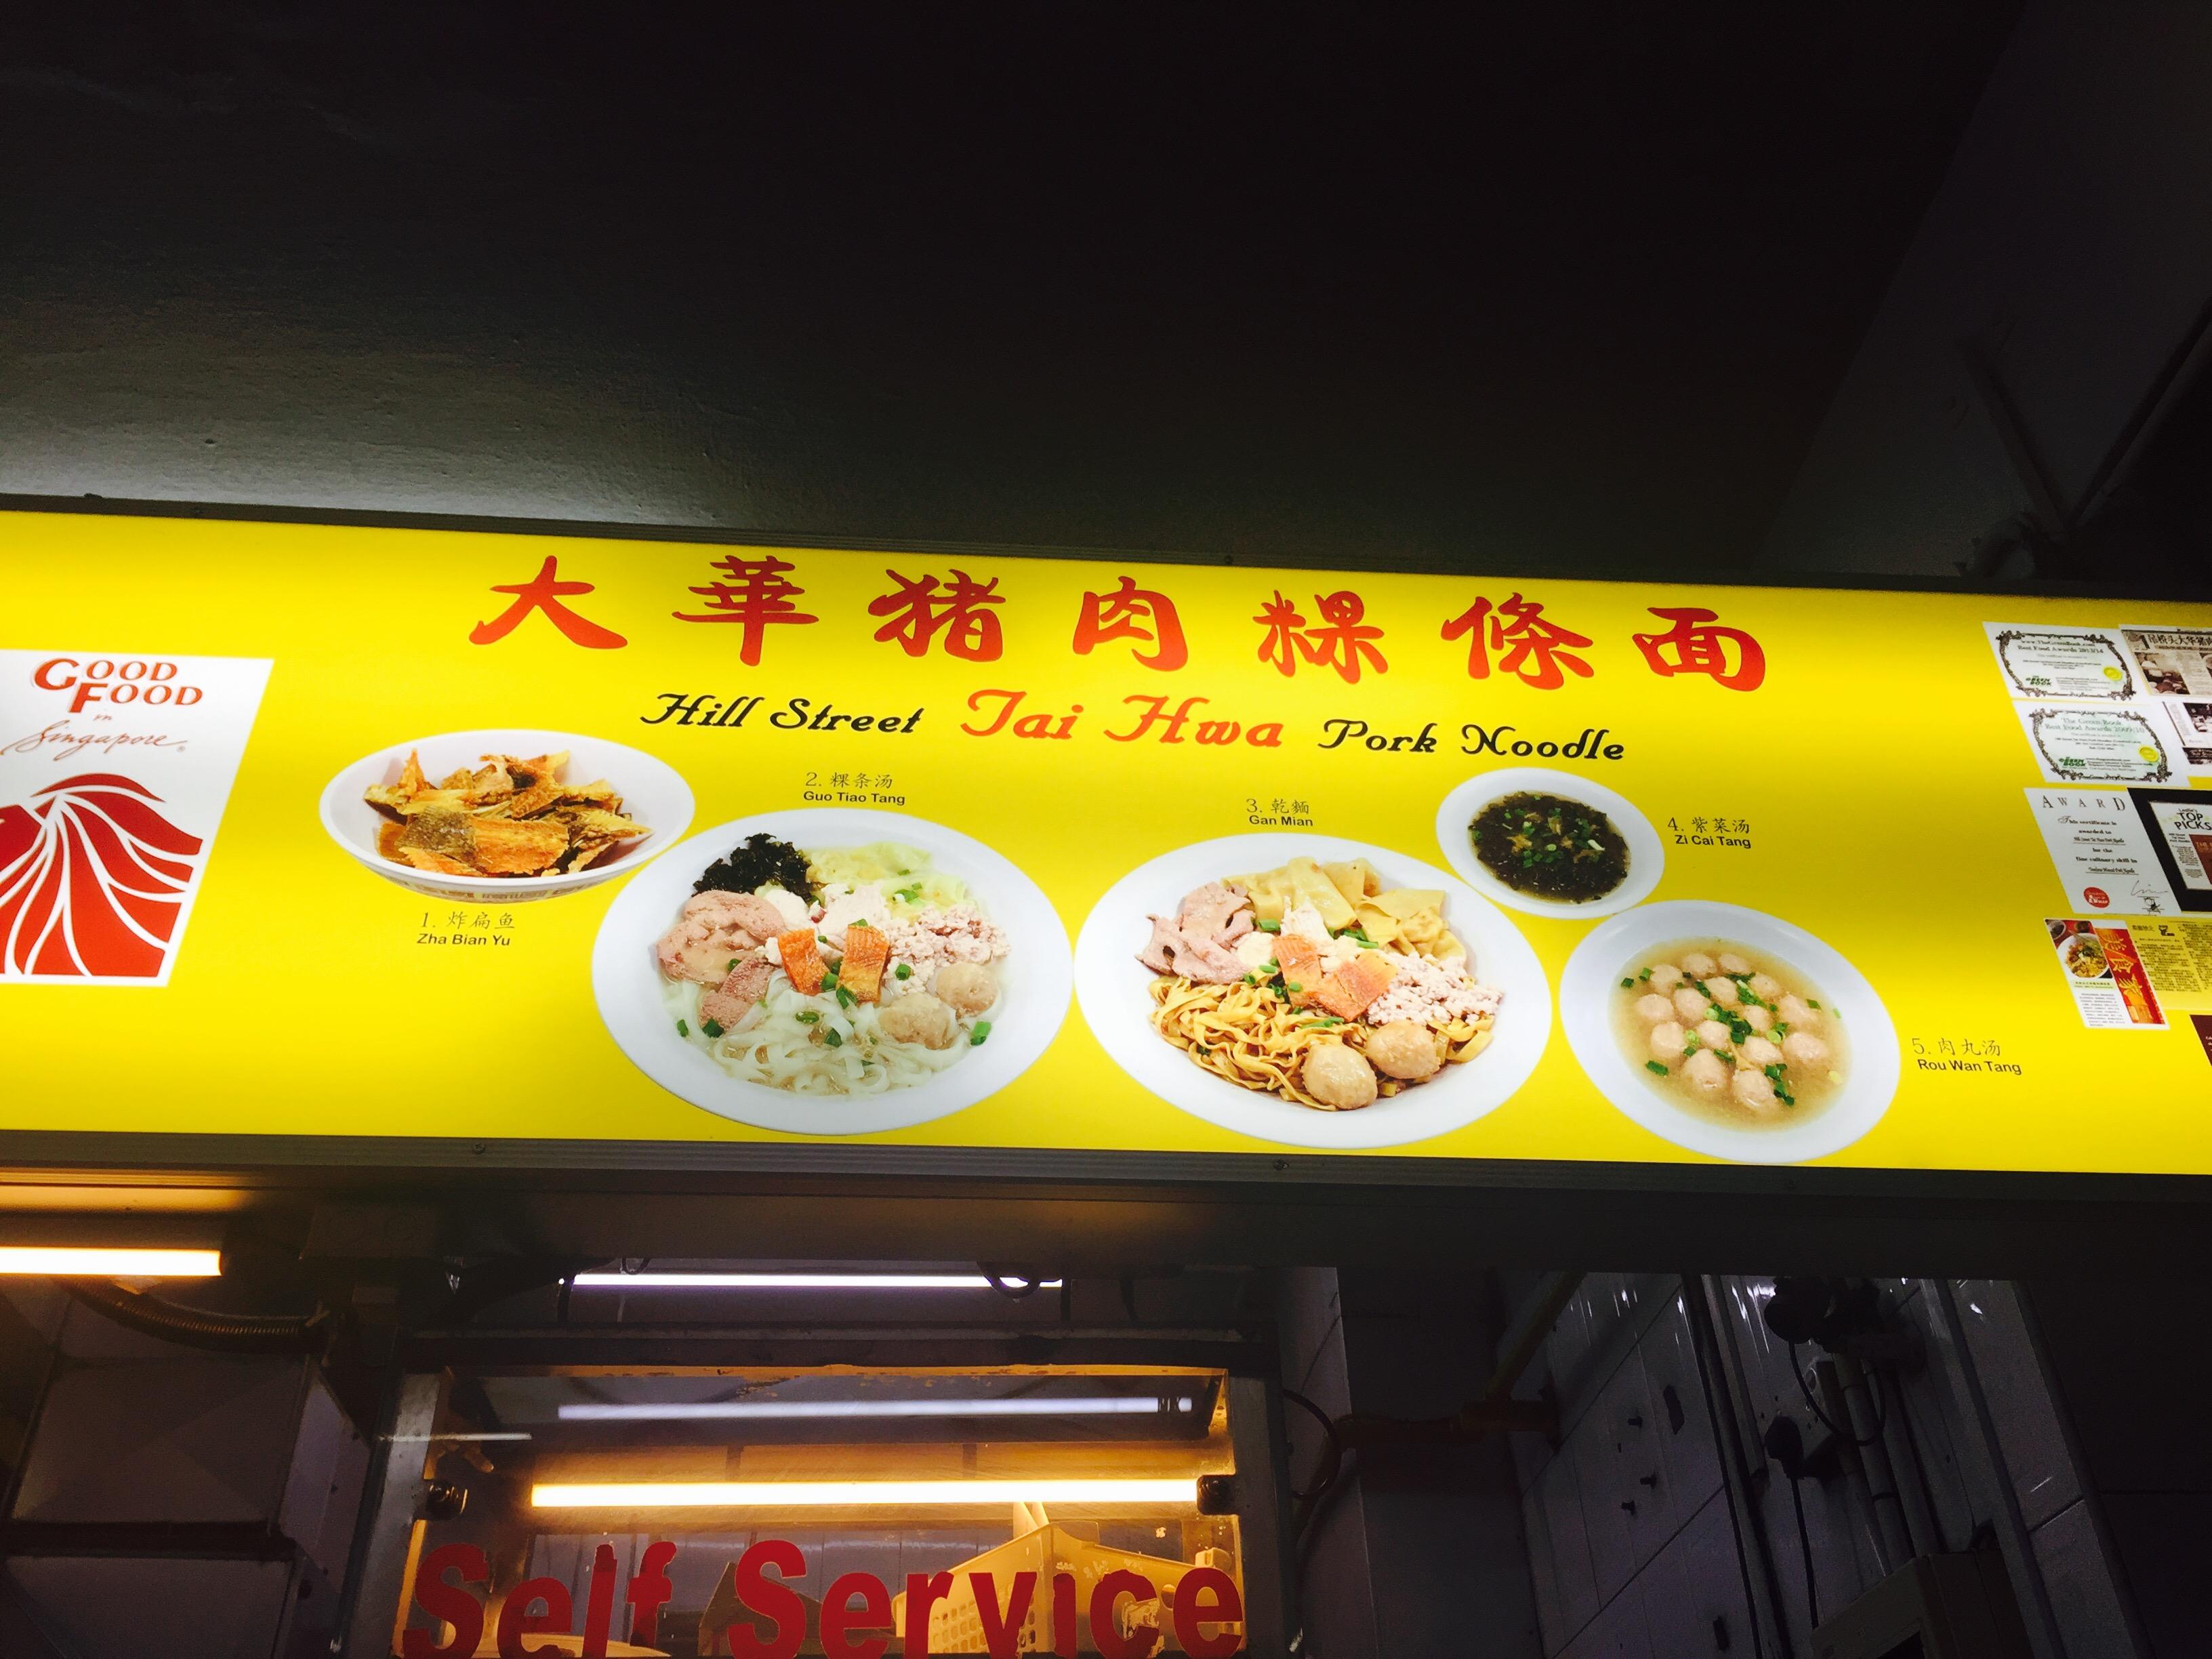 tai hwa pork noodle, Singapore Budget Trip Itinerary, Mark Cha Travels, wandering couple philippines, wandering couple, couple travel blog, couple travel bloggers